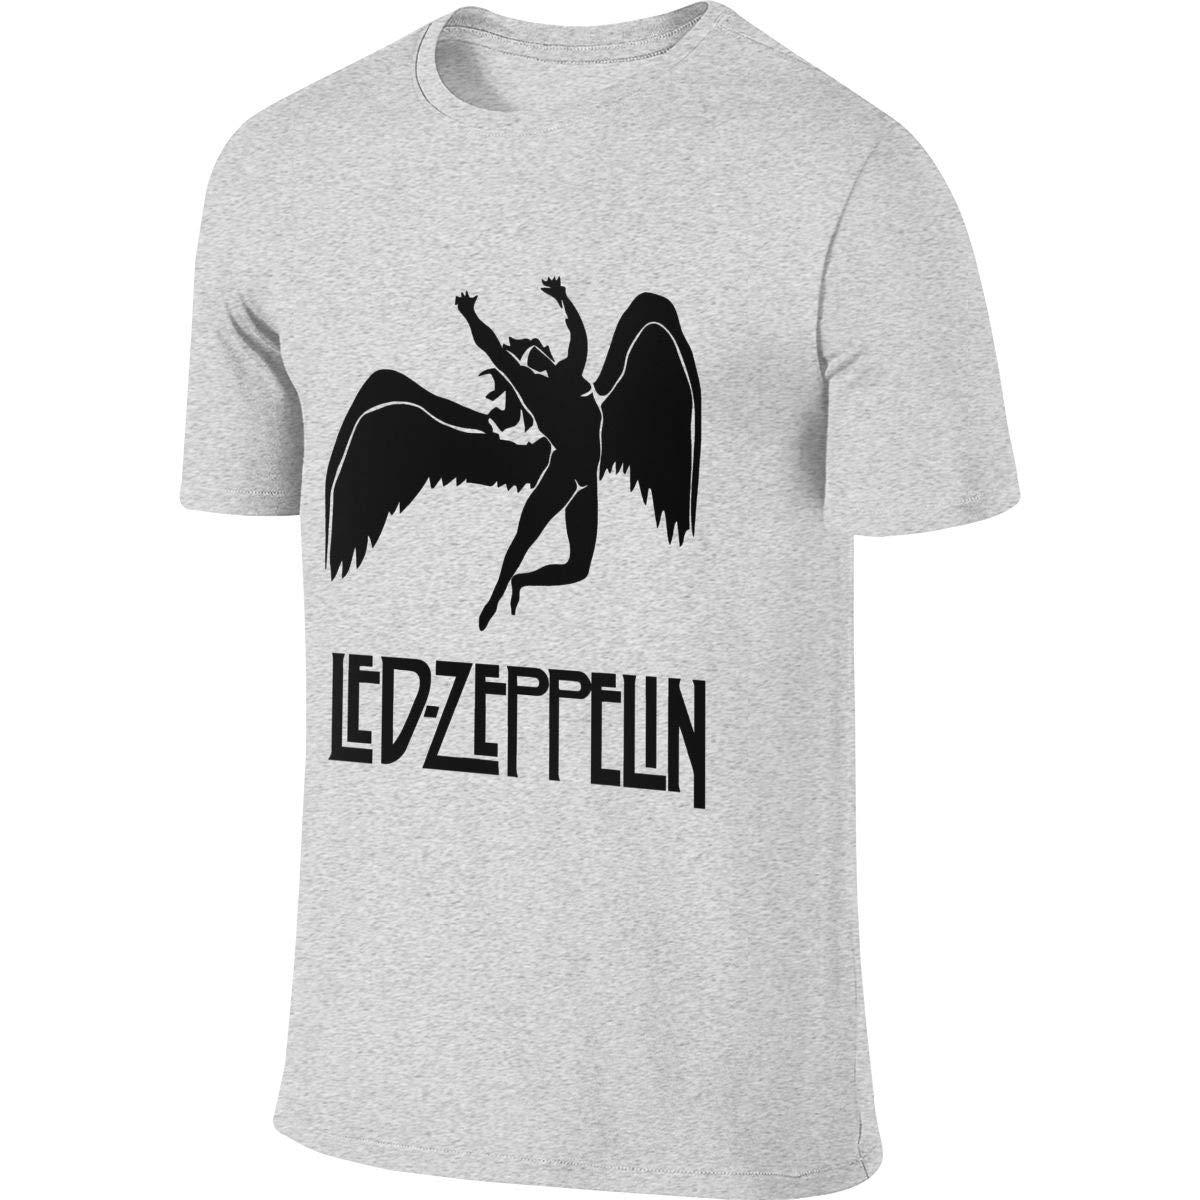 Hengteng Mens Personalized Classic Tee Shirt Led Zeppelin T-Shirts